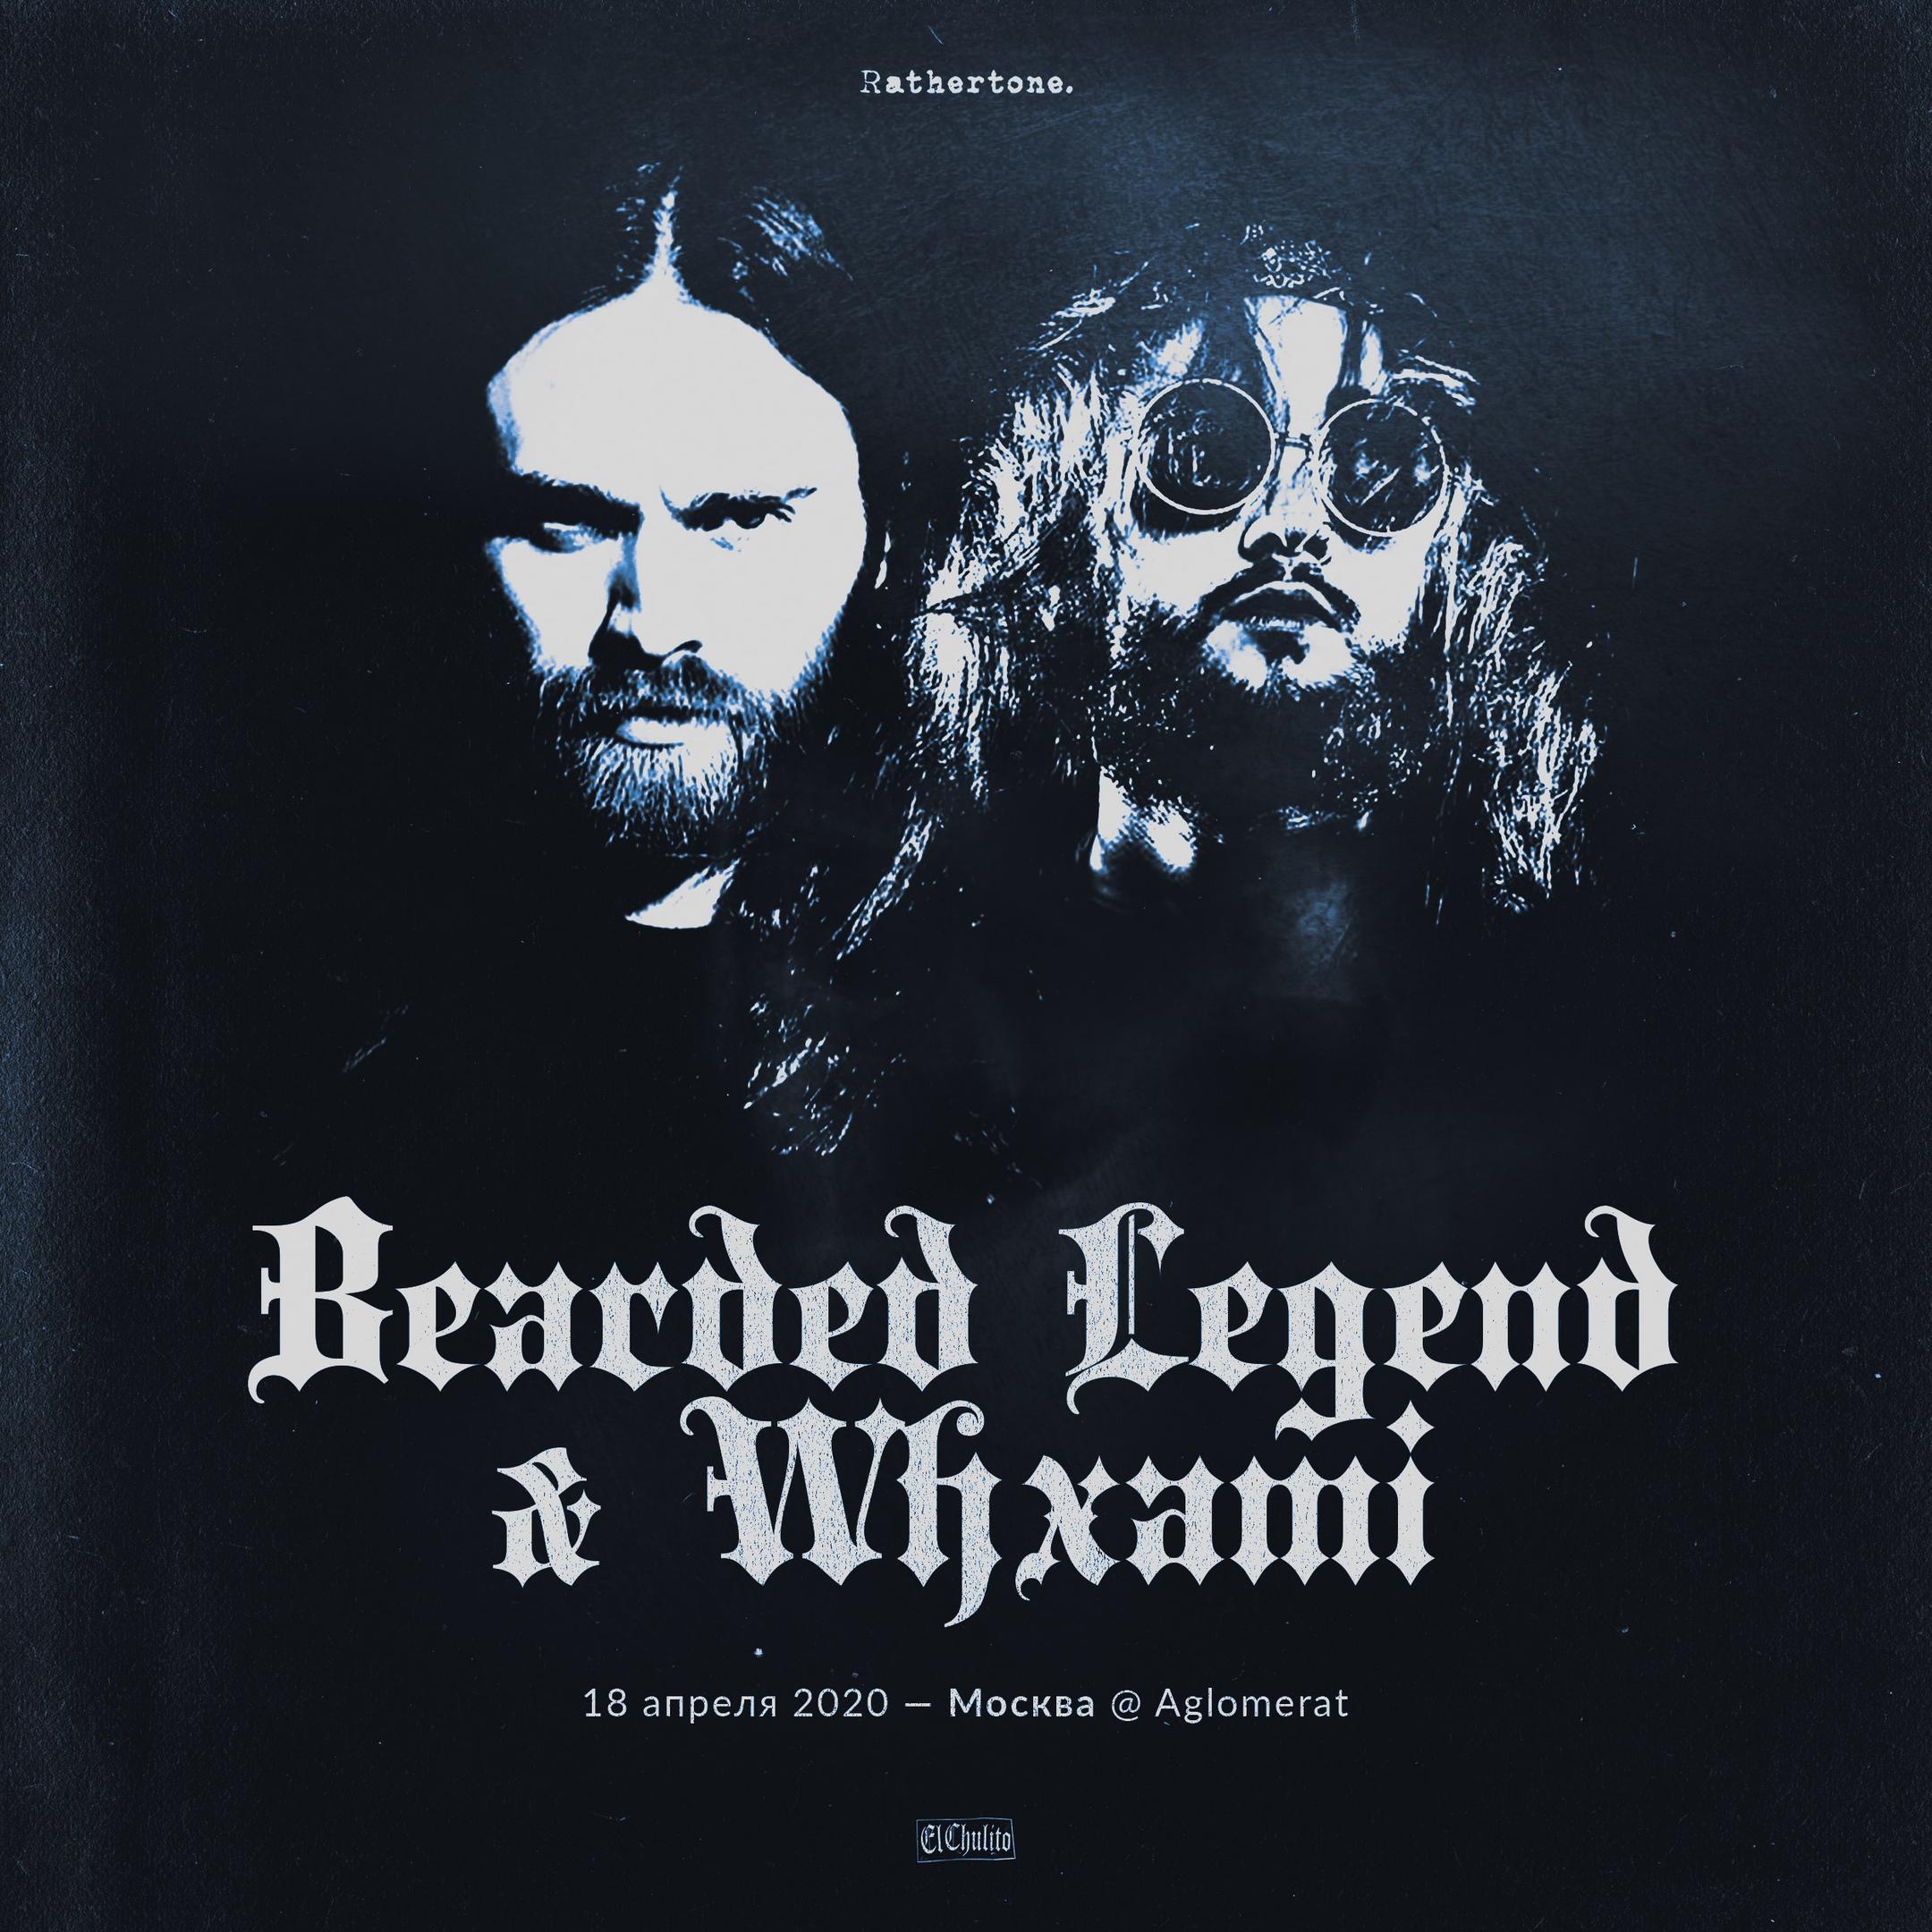 Bearded Legend x Whxami